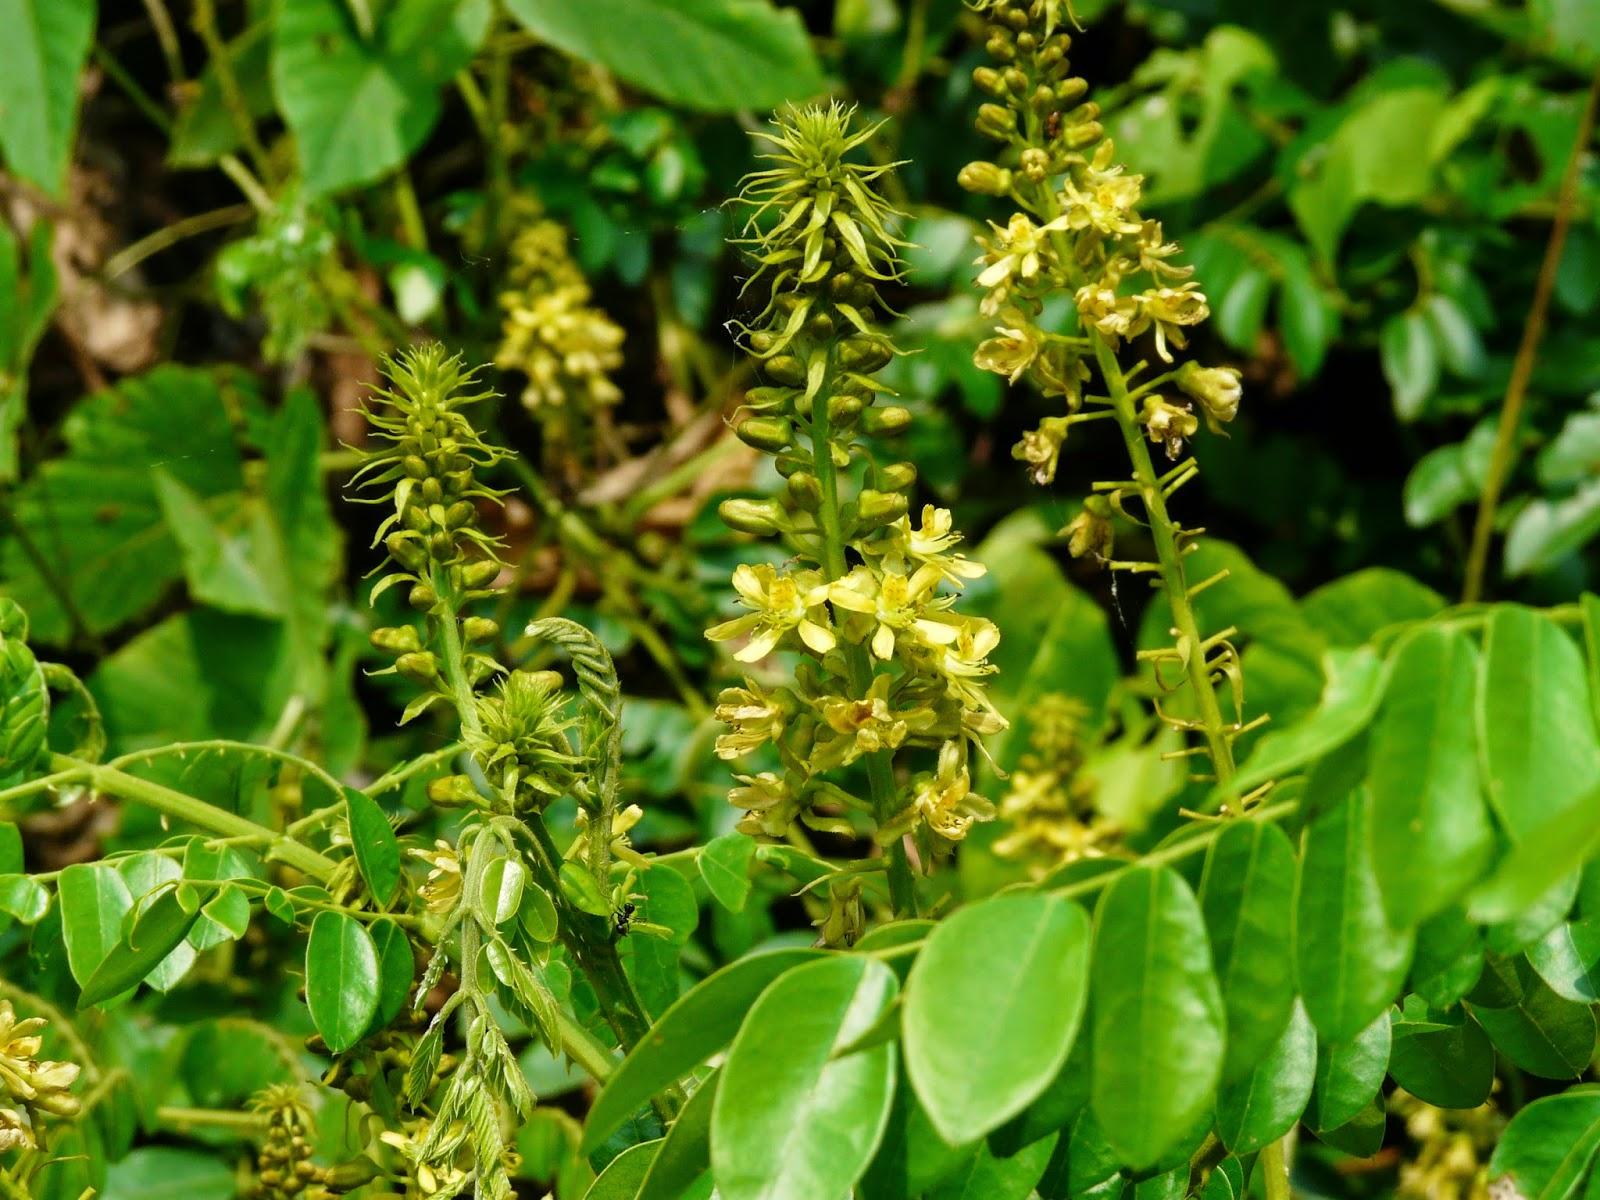 Caesalpinia bonducella - கழற்சிக்காய் (கச்சூரம்